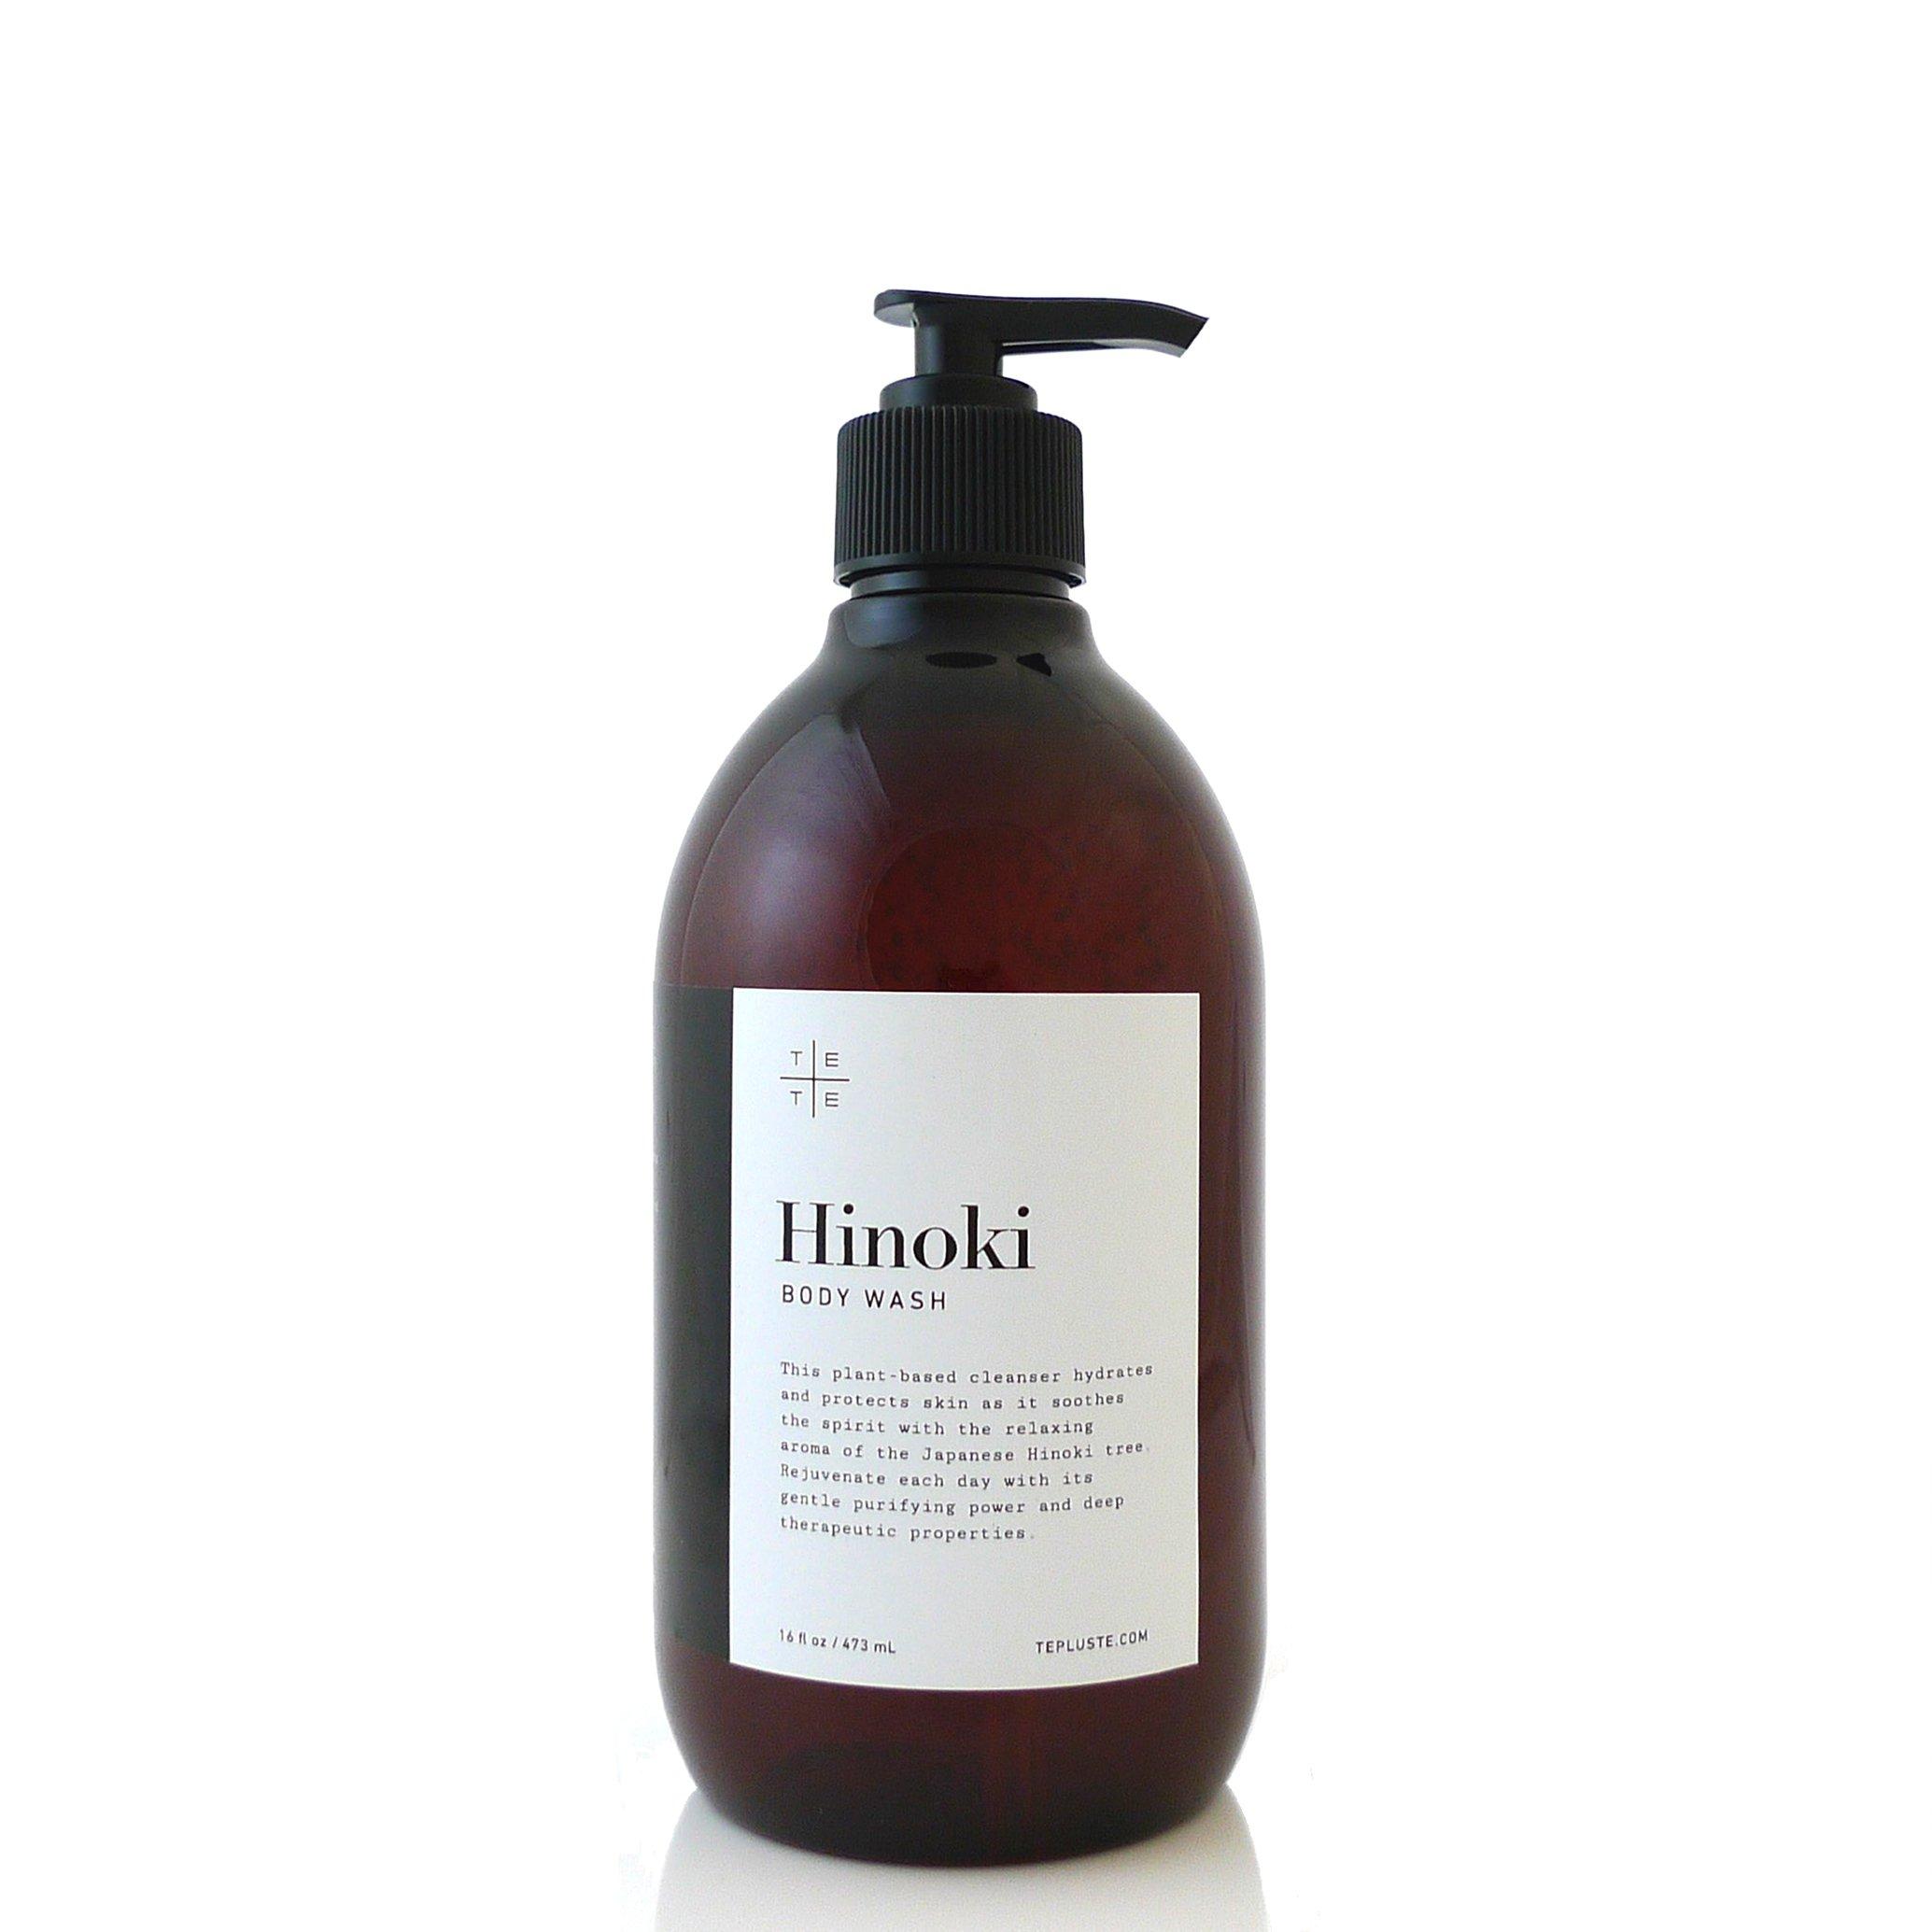 HINOKI BODY WASH made with organic ingredients by te+te 16 fl.oz. by te+te